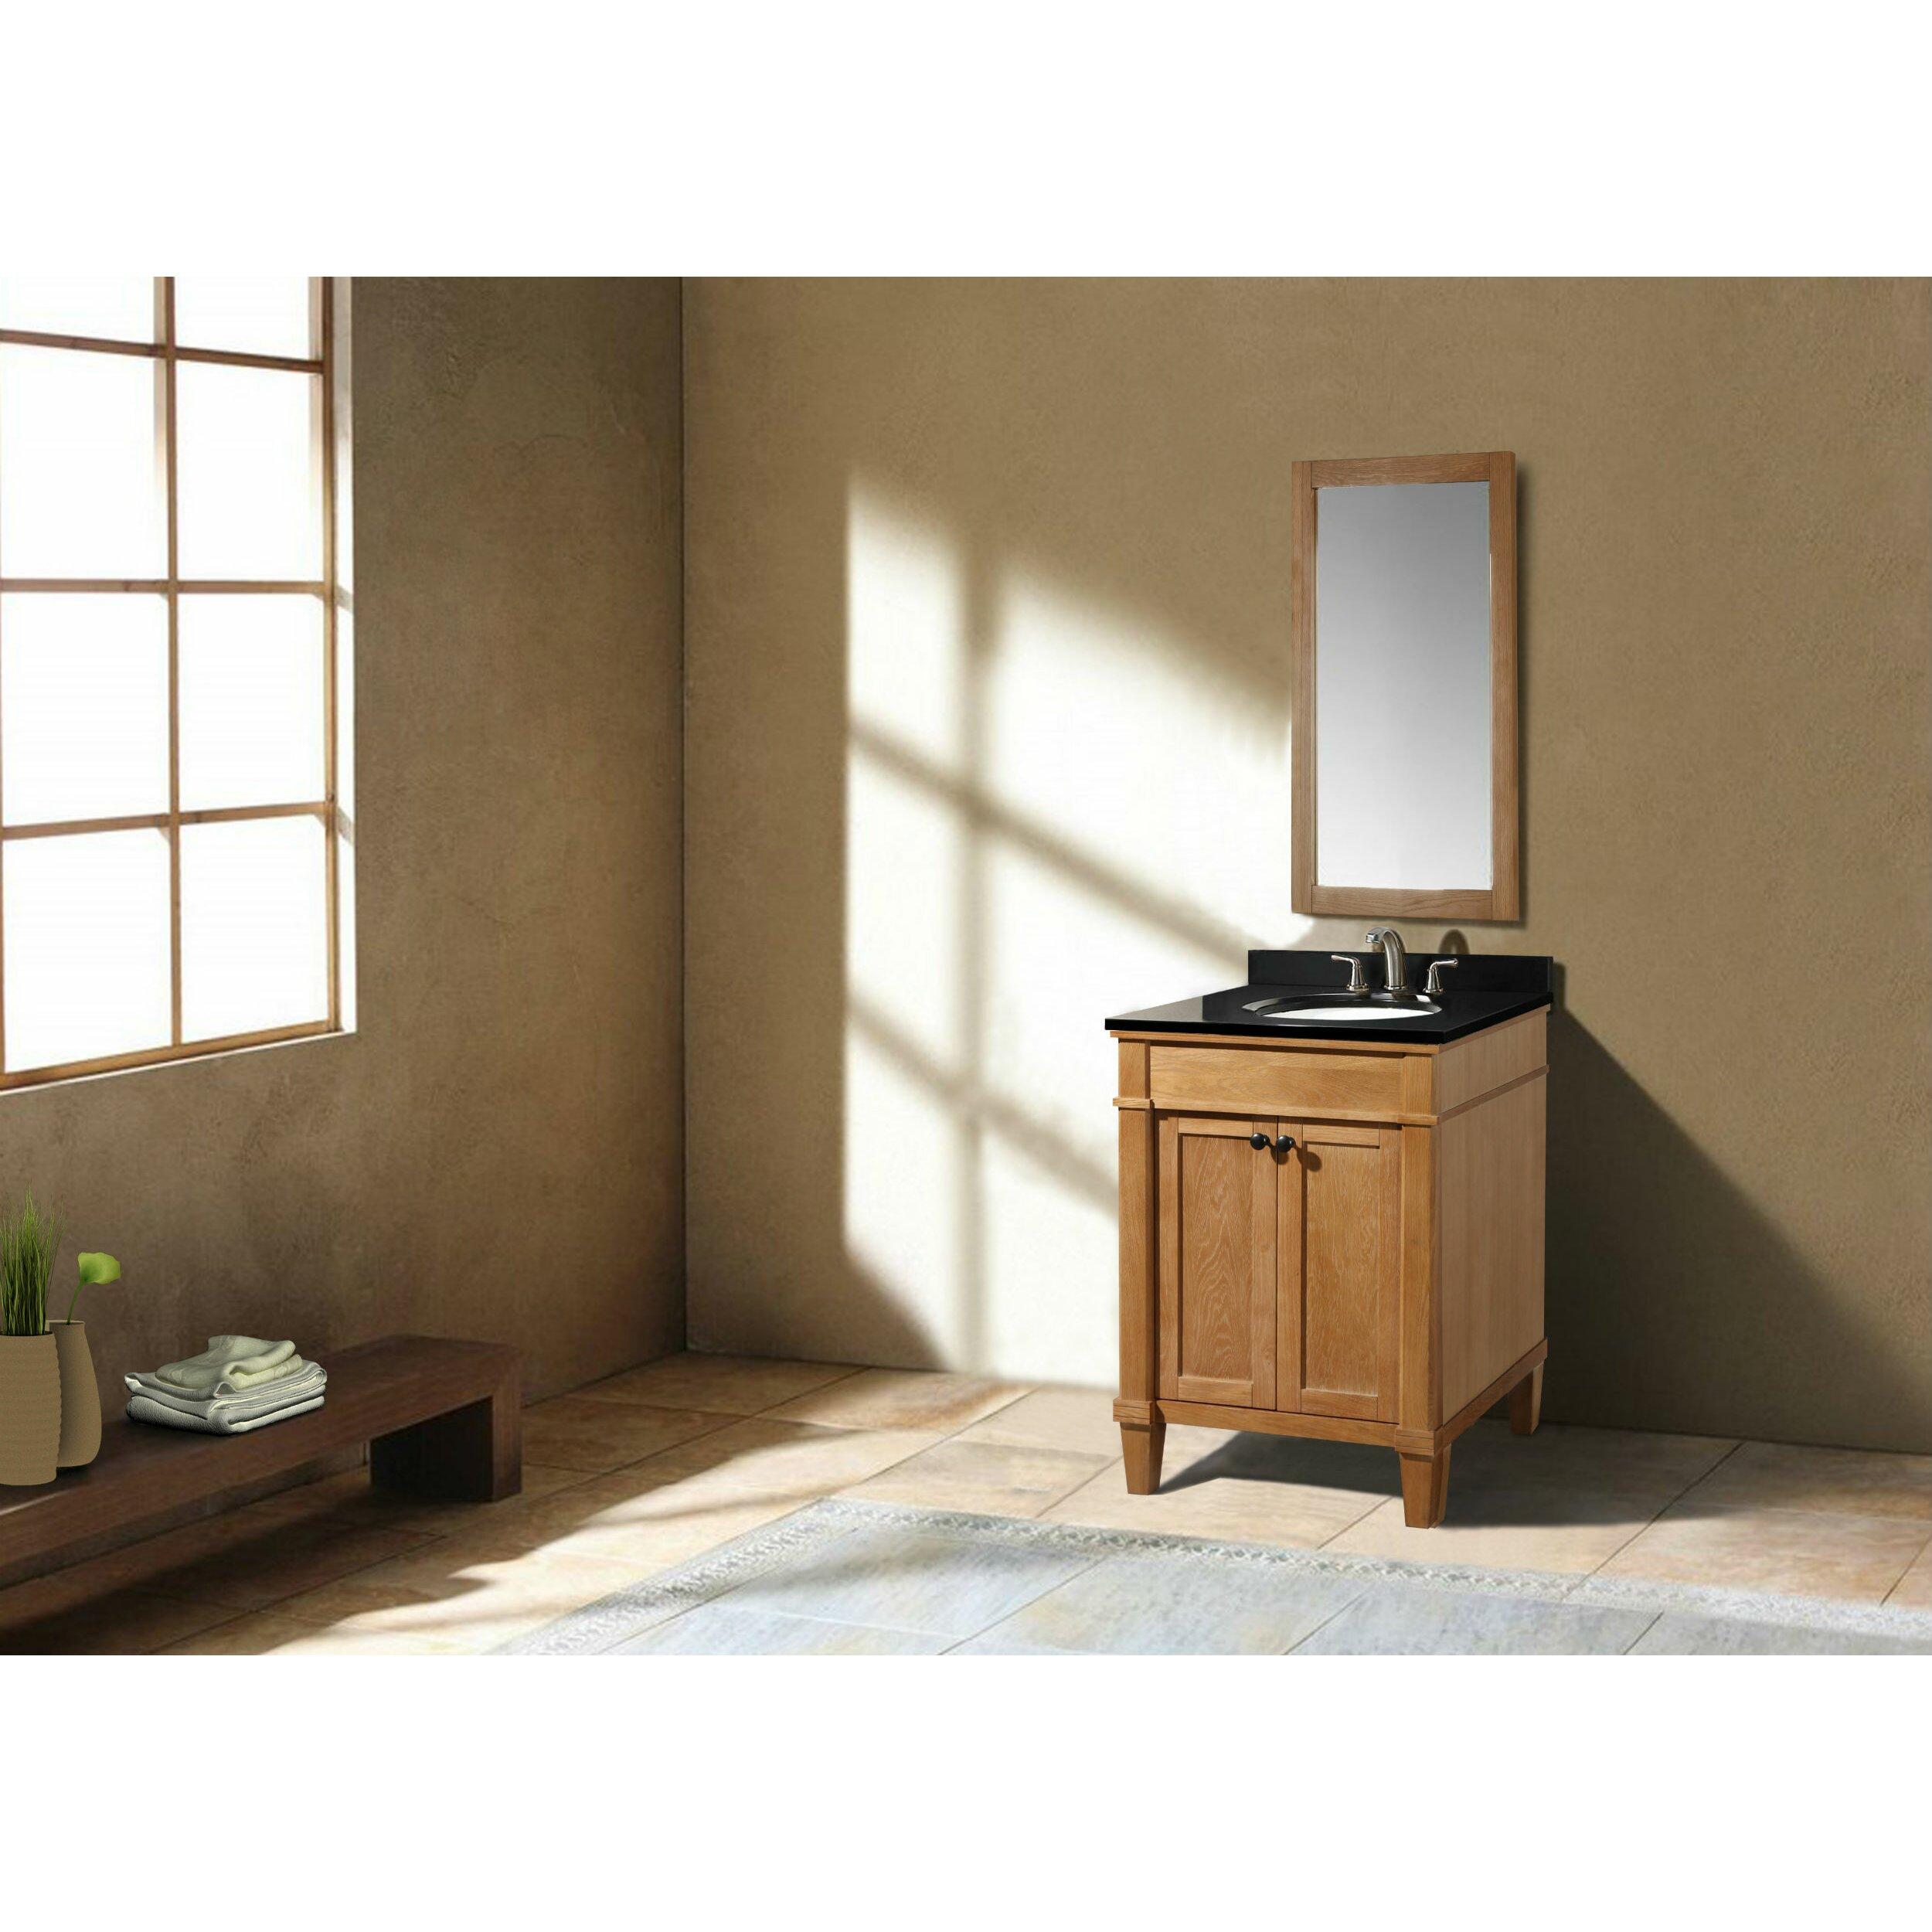 Bathroom Vanity Reviews modern bathroom vanity set izano. legion furniture 30 single